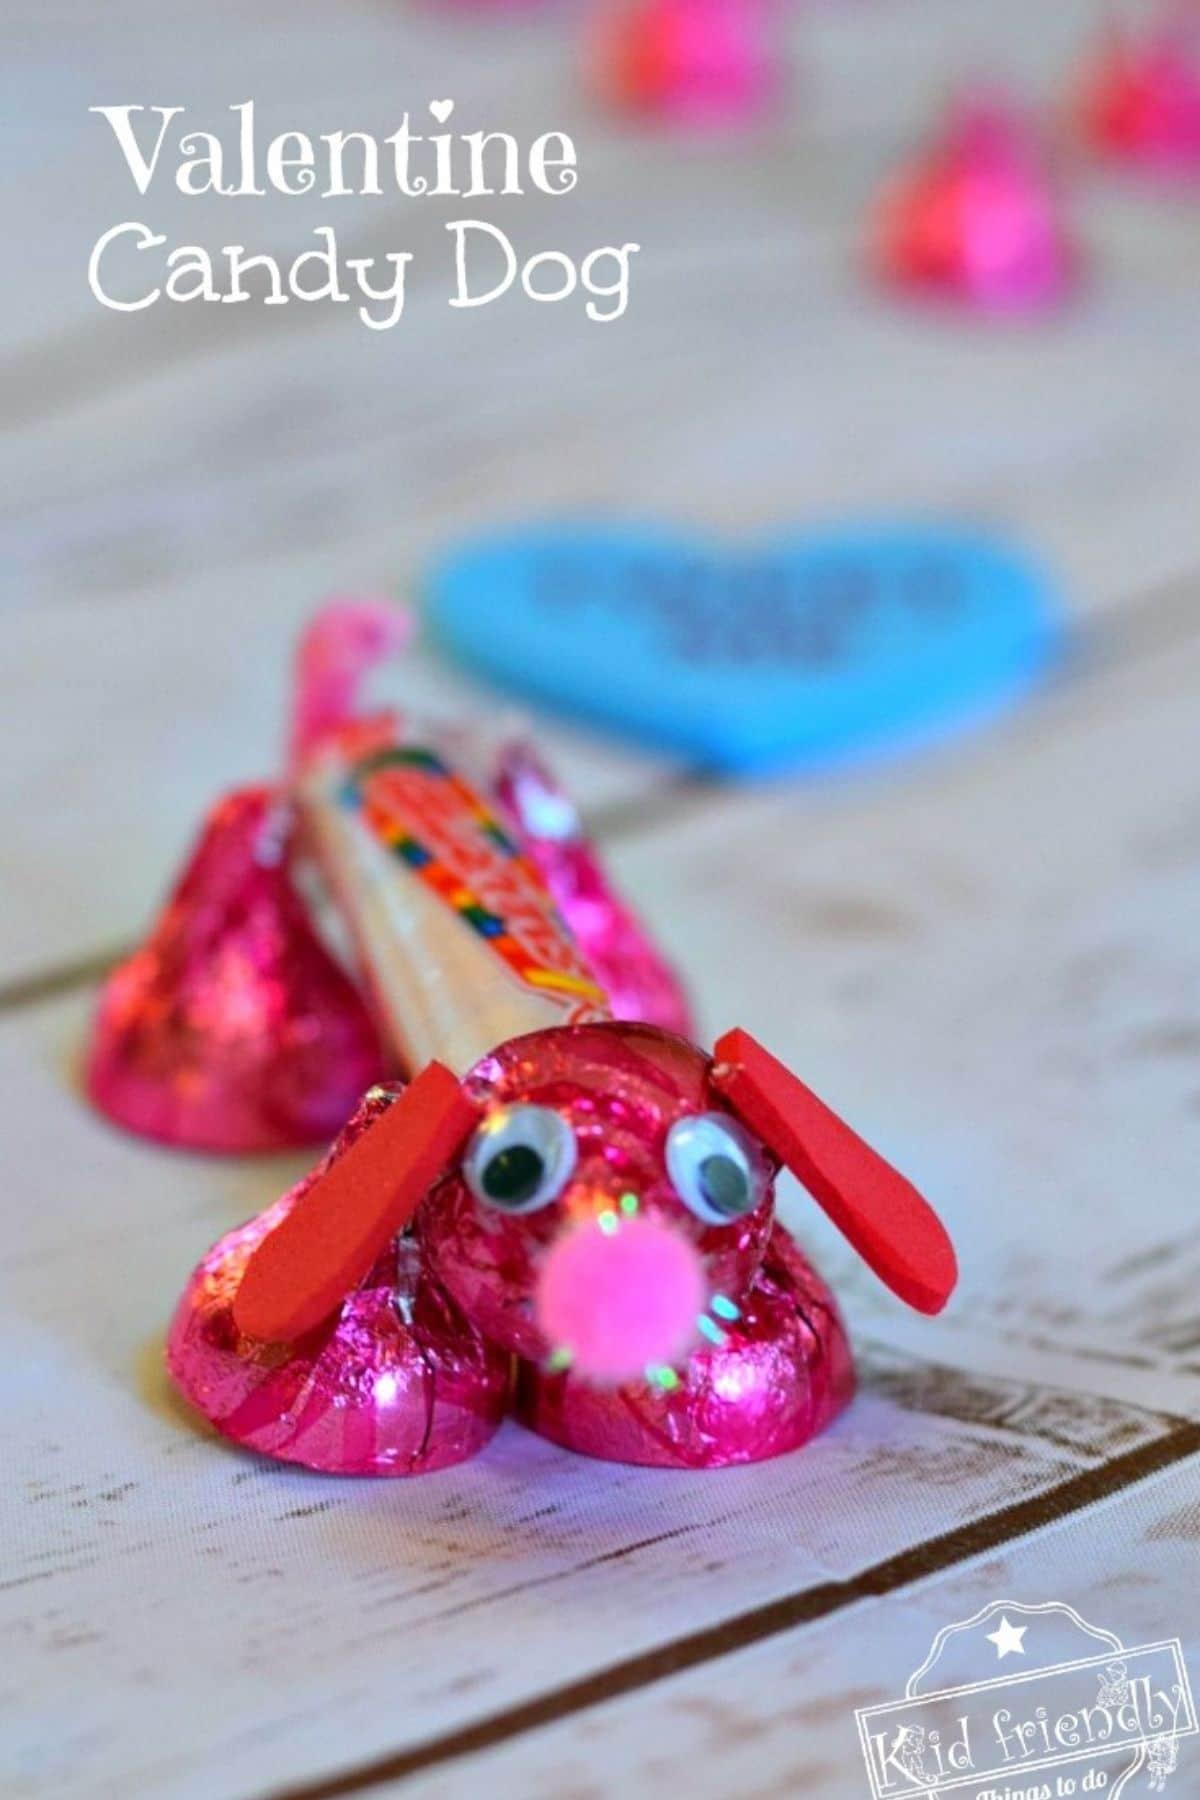 Candy dog